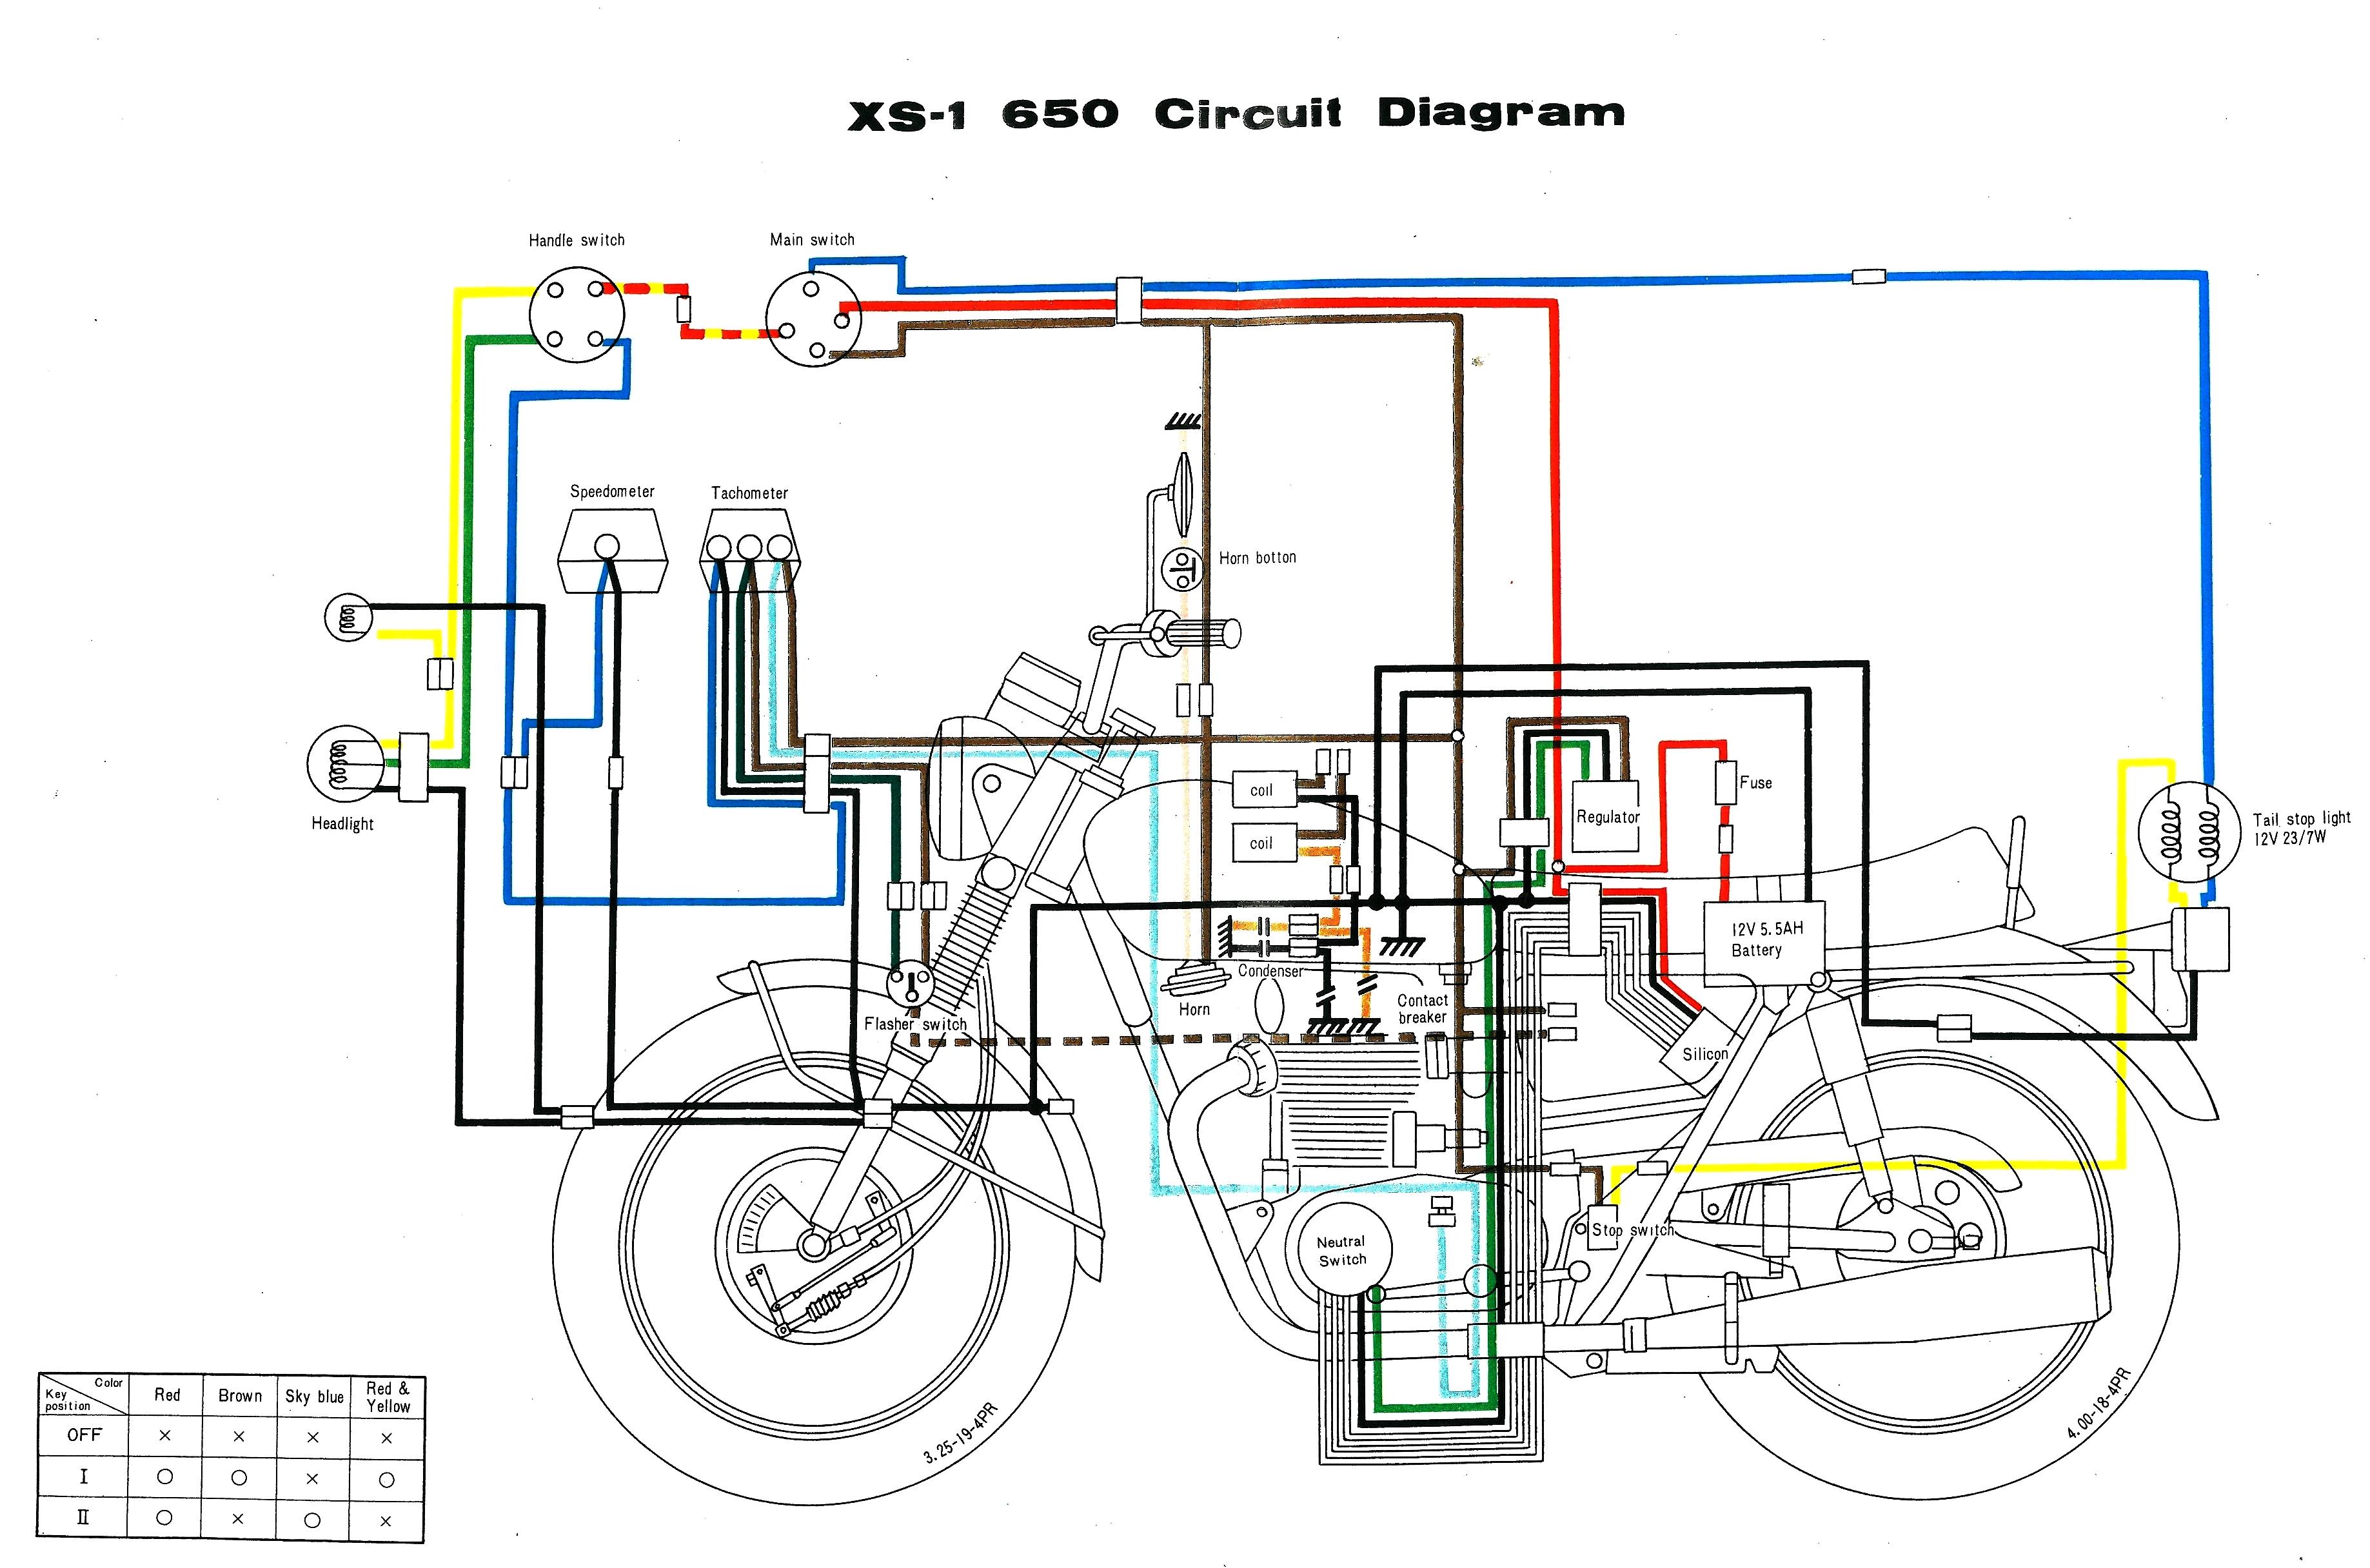 Lifan 125cc engine diagram wiring harley davidson fxr wiring diagram 125cc engine diagram wiring diagrams schematics 70 xs1 wiring diagram1 125cc engine diagramhtml cheapraybanclubmaster Gallery